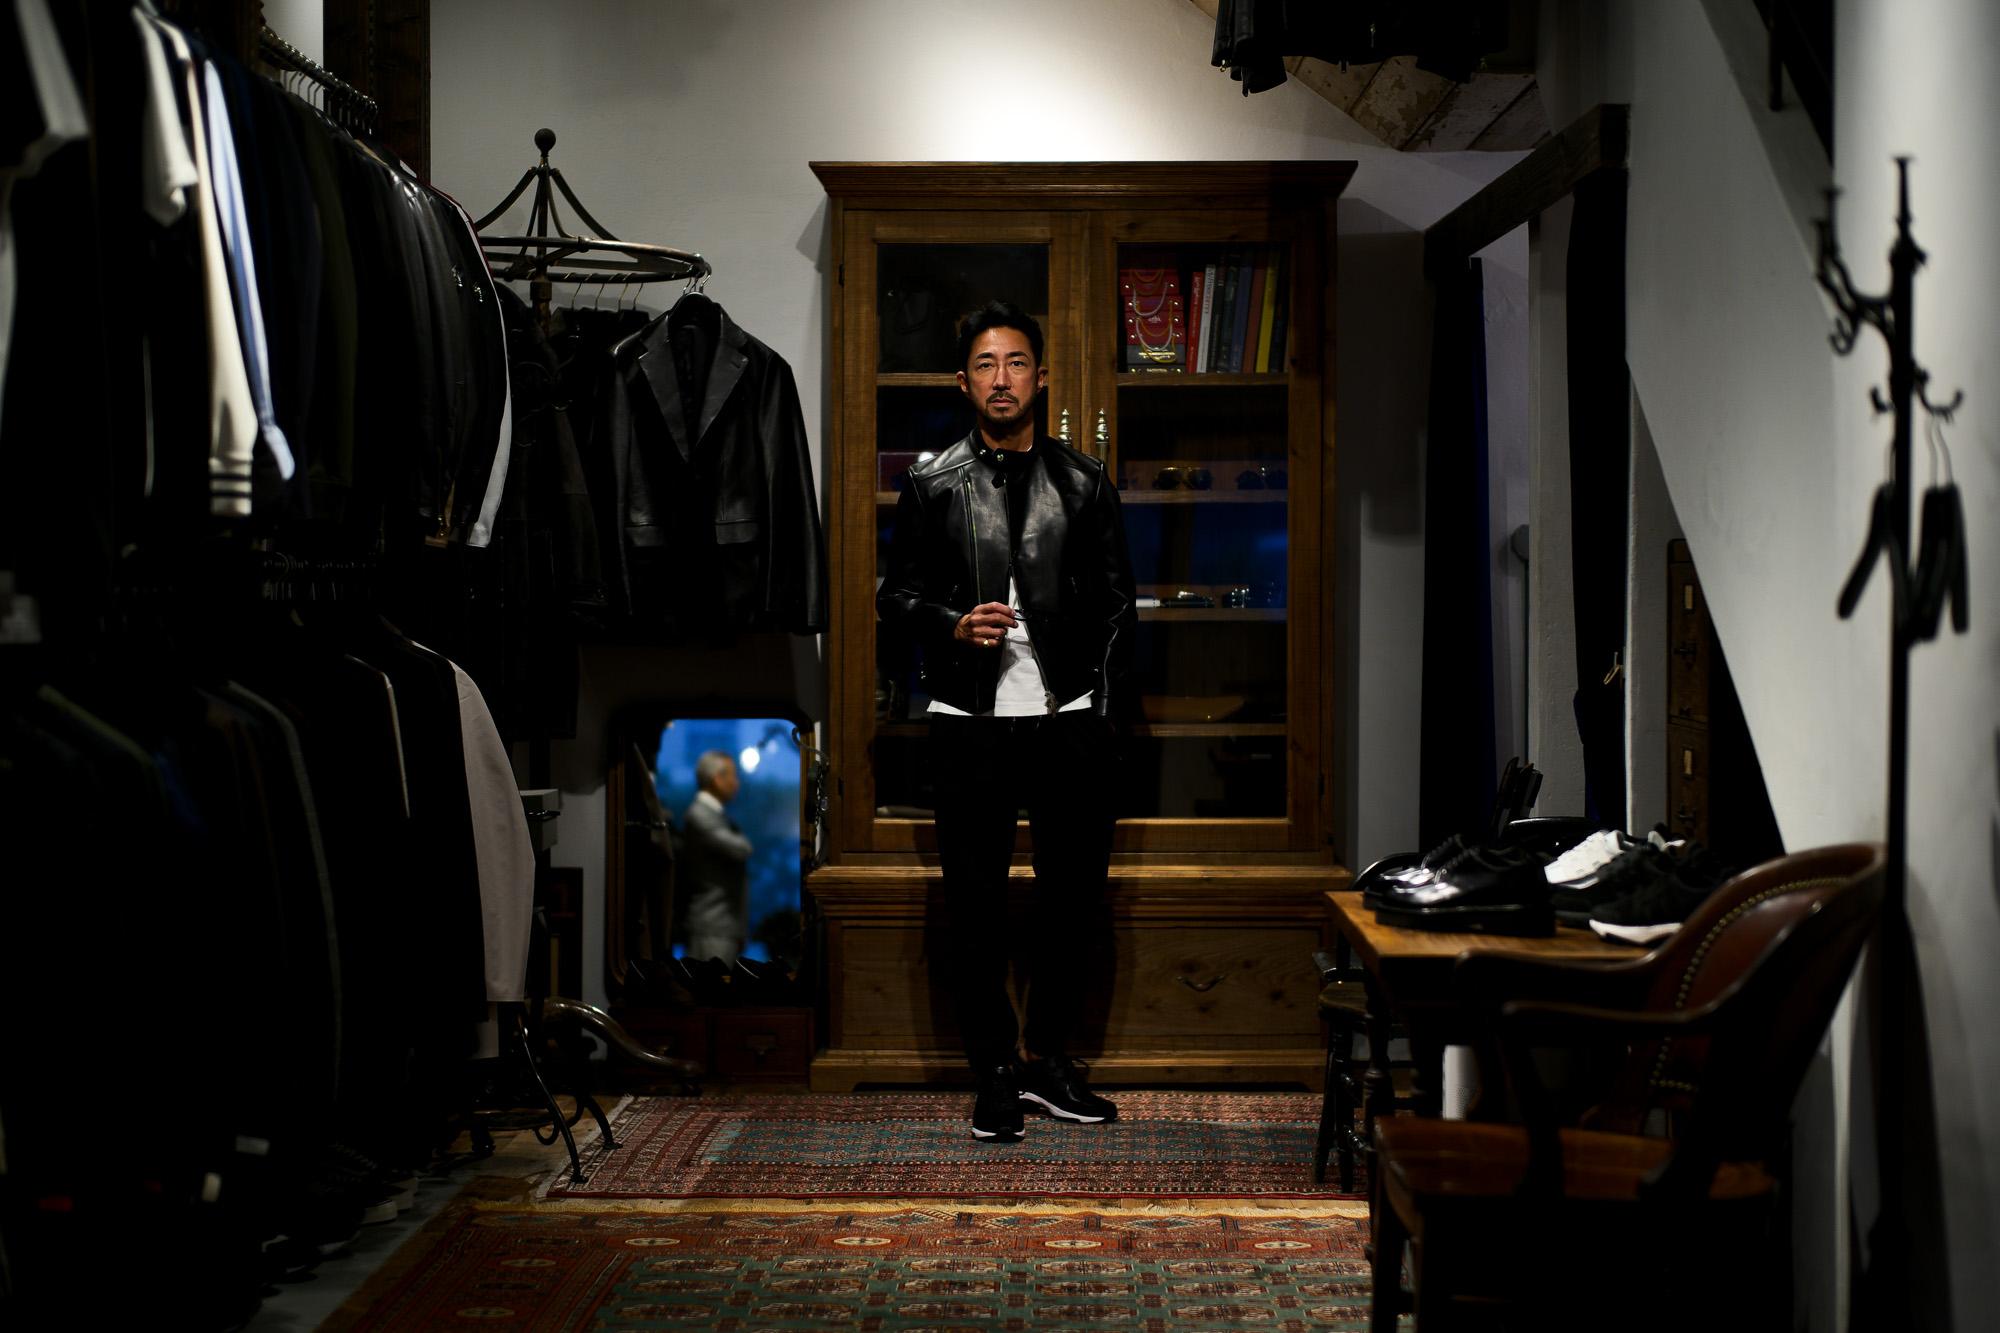 WH (ダブルエイチ) WH-0111 Faster Last(ファスターラスト) French Kip Leather フレンチキップ レザー スニーカー BLACK×WHITE (ブラック×ホワイト) MADE IN JAPAN (日本製) 2019 秋冬新作 愛知 名古屋 alto e diritto altoediritto アルトエデリット